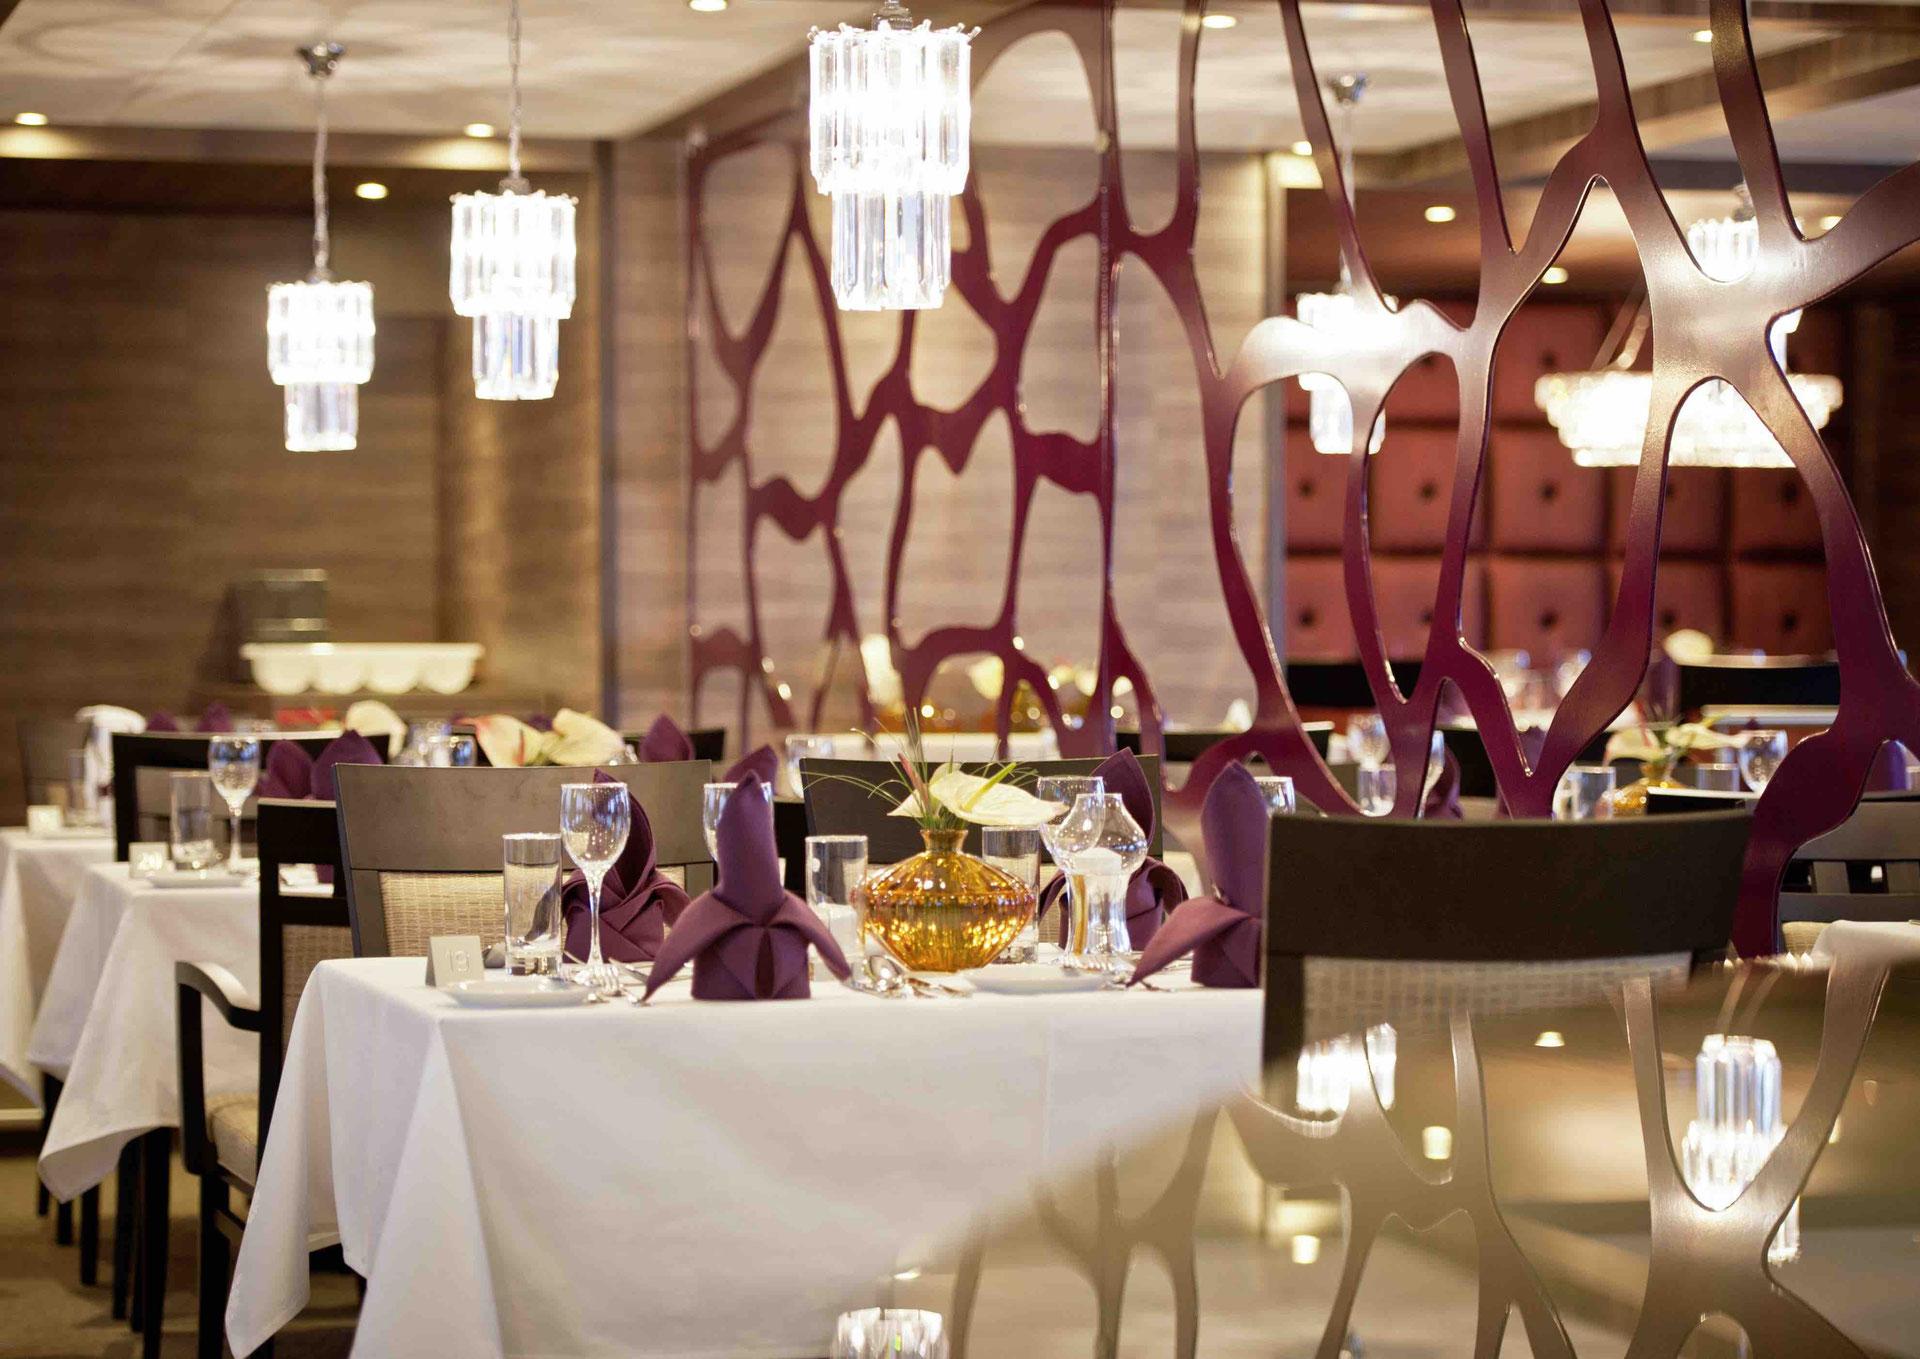 AMADEUS Silver II Panorama-Restaurant